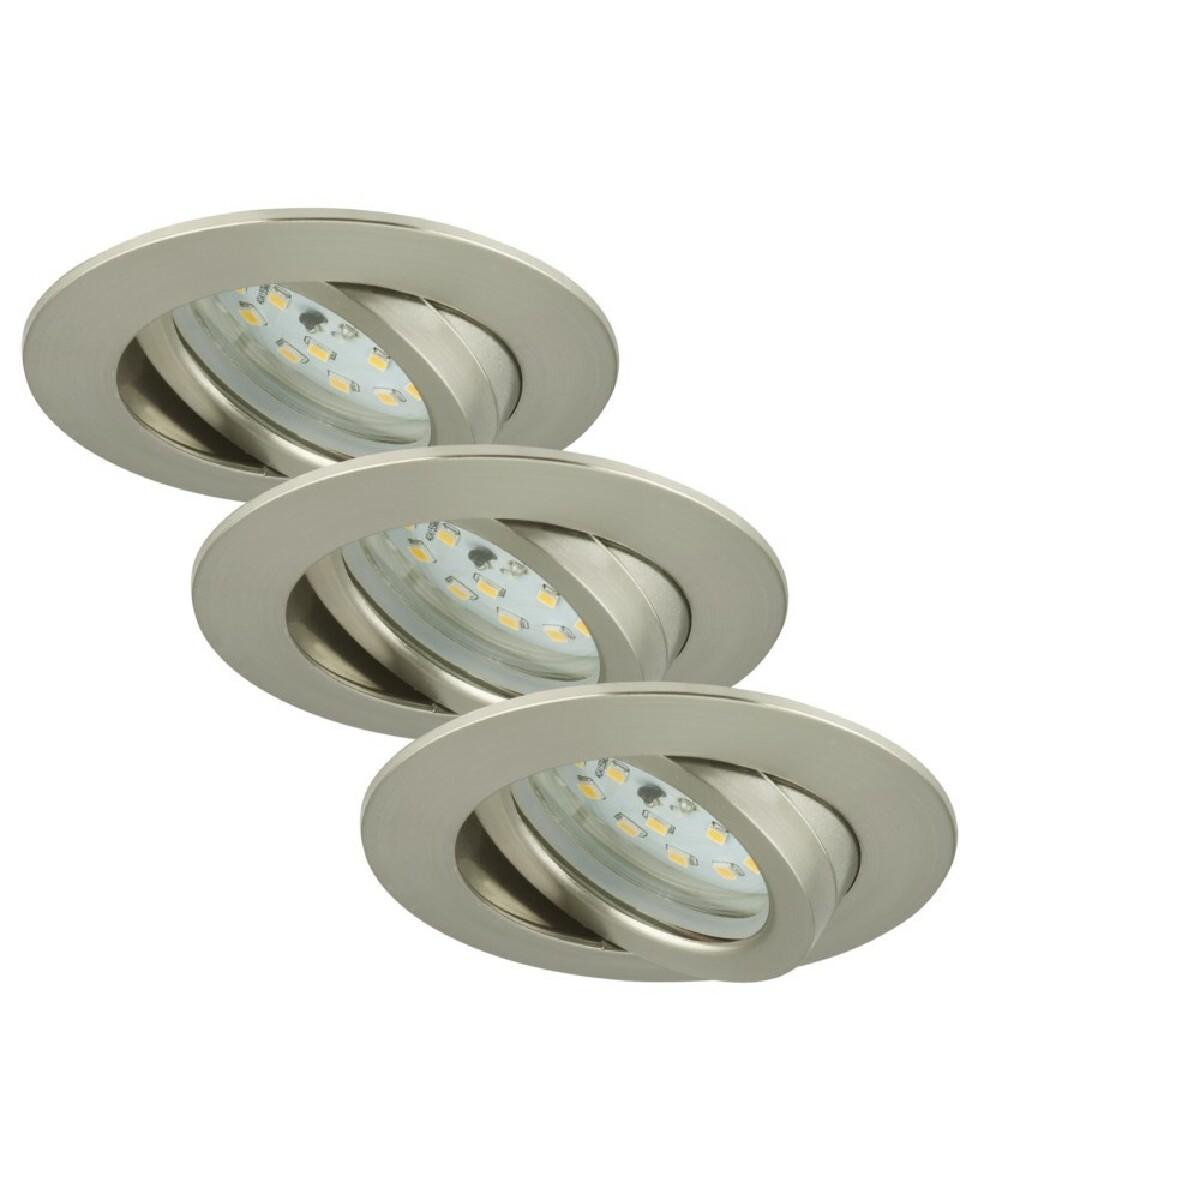 Briloner Leuchten Spot LED Encastrable Orientable BRILONER module 5W Ip23 Nickel mat/Verre Nickel mat 90000706649